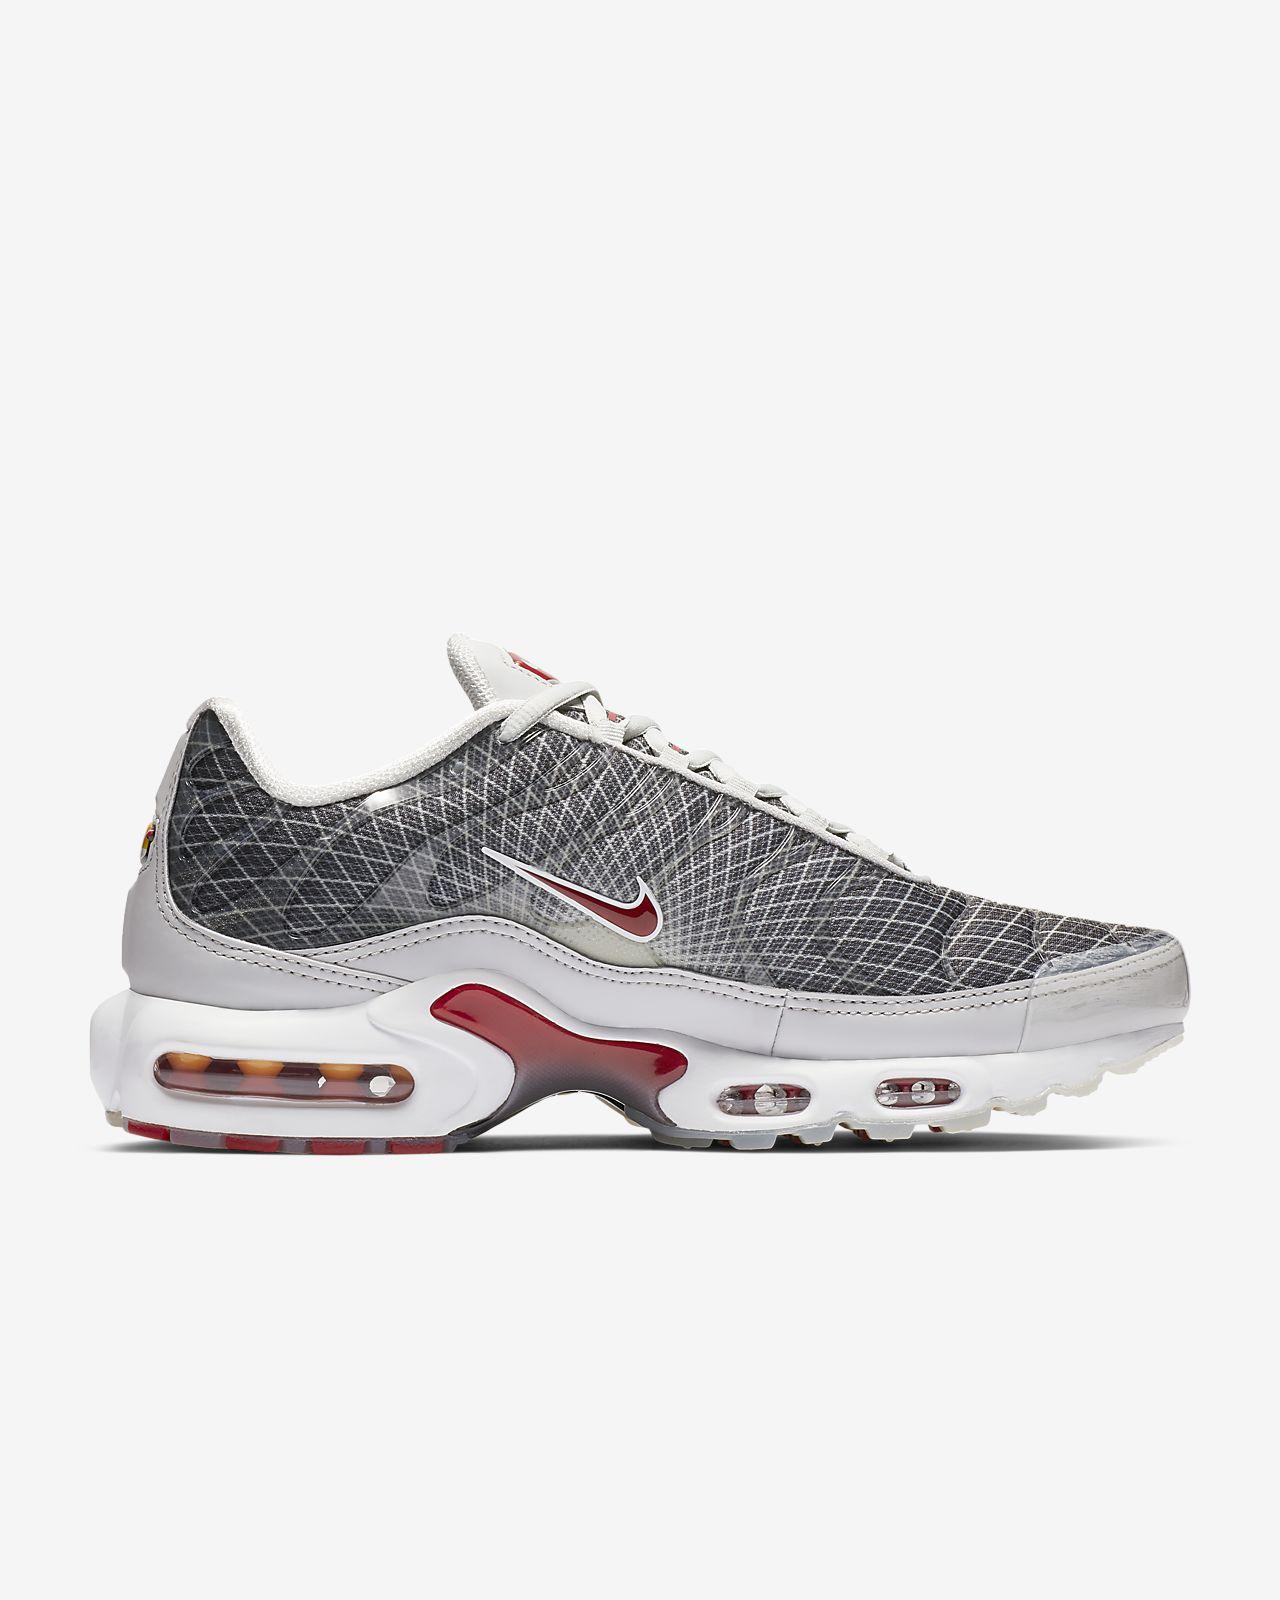 promo code 73536 02c6c Nike Air Max Plus OG Shoe